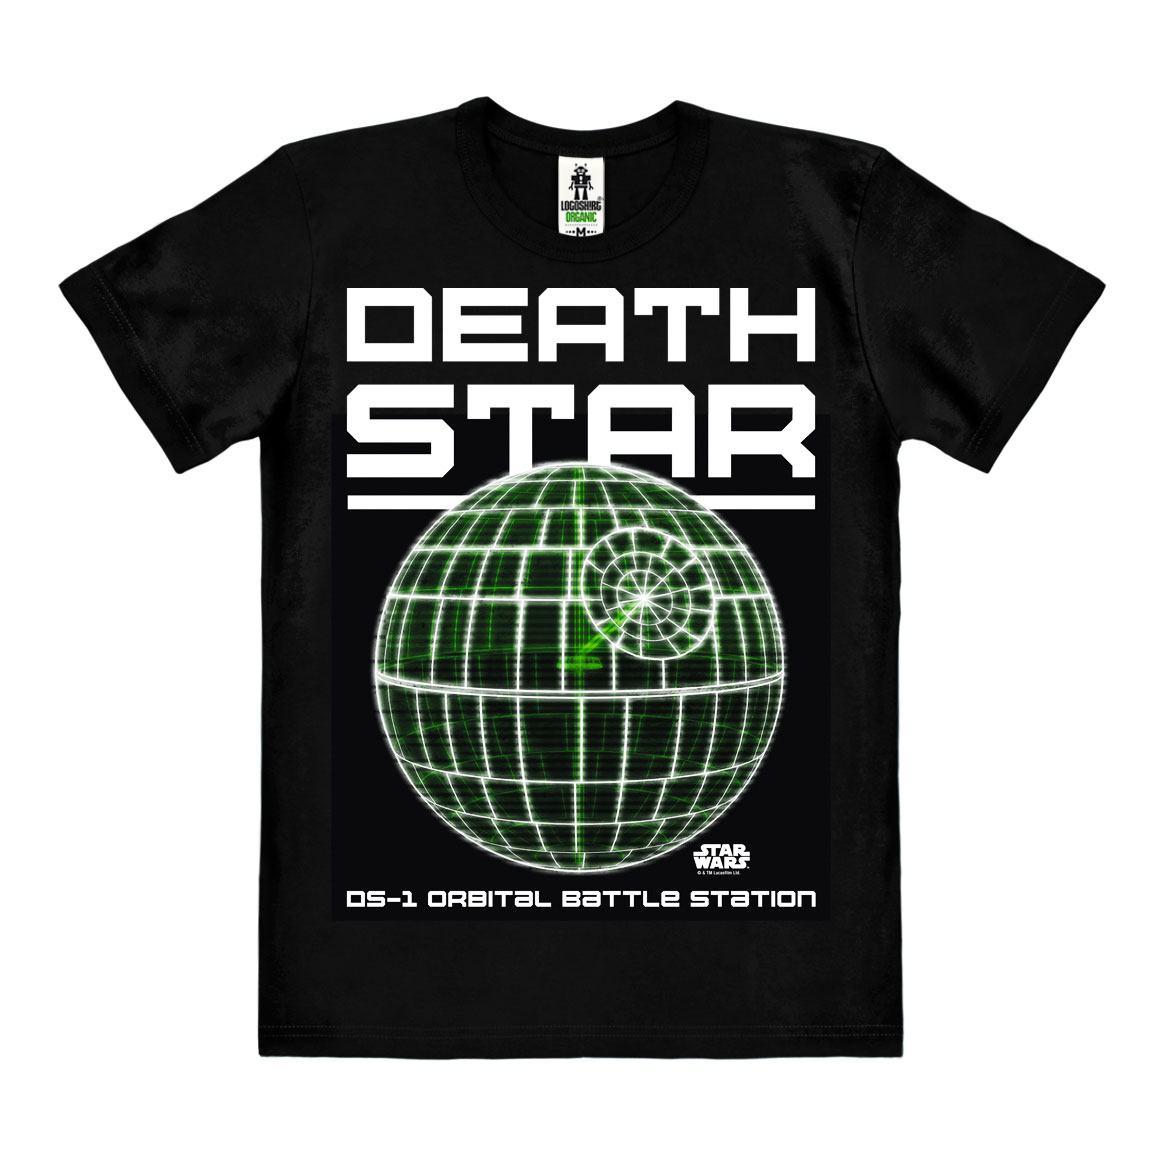 Star Wars Rogue One Easy Fit Organic T-Shirt Death Star Size XL